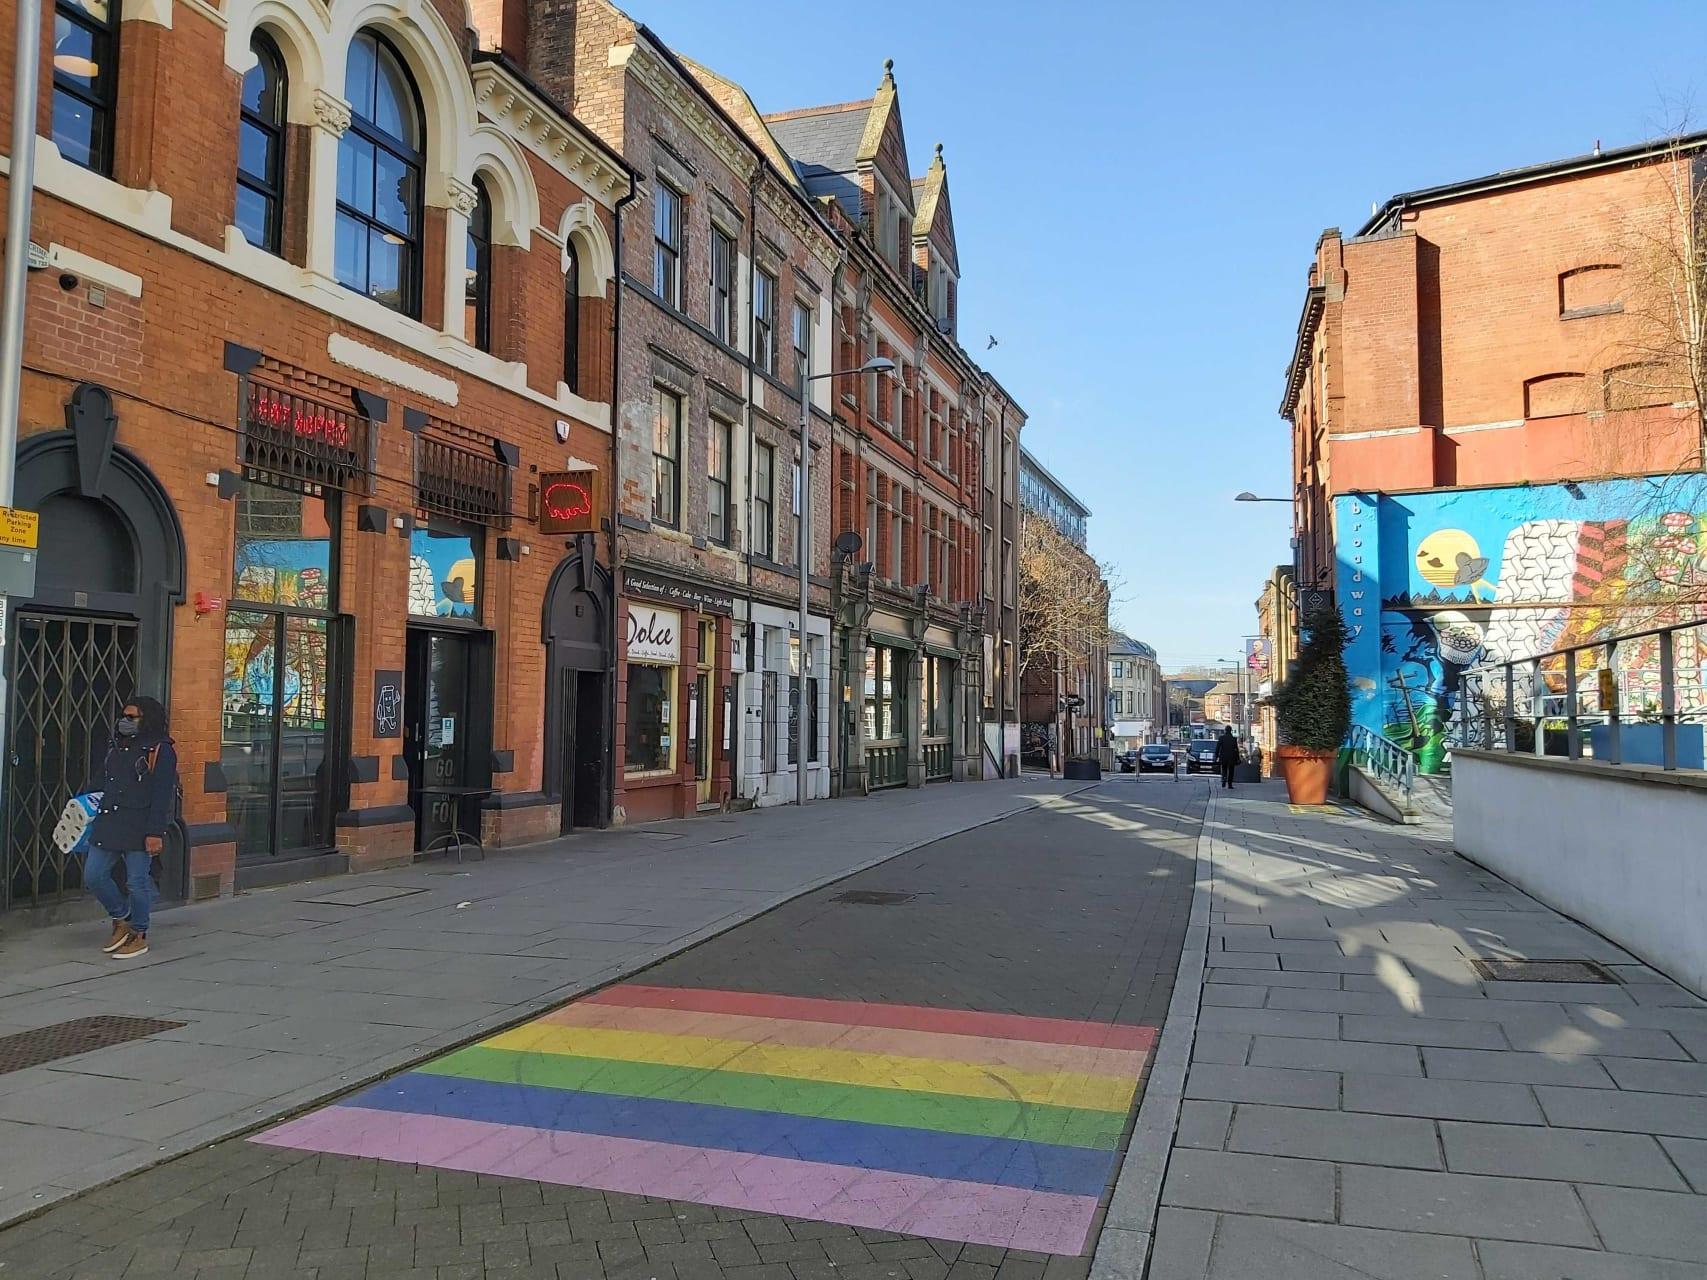 Nottingham - Happening Hockley